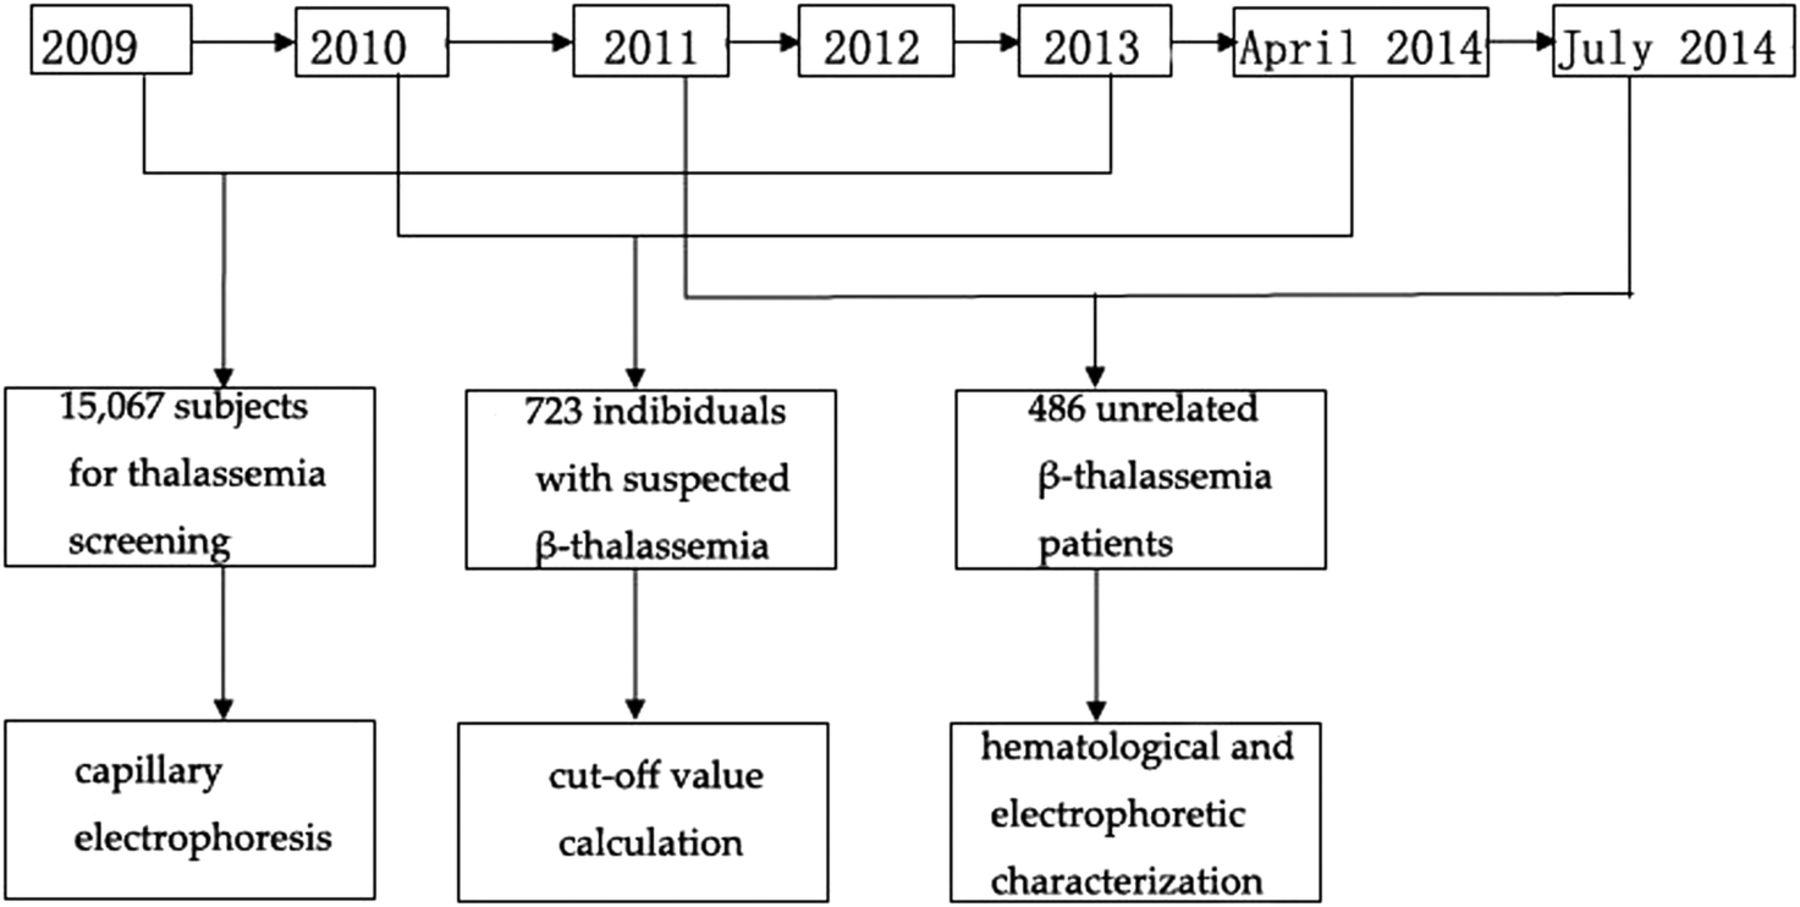 Haematological and electrophoretic characterisation of β